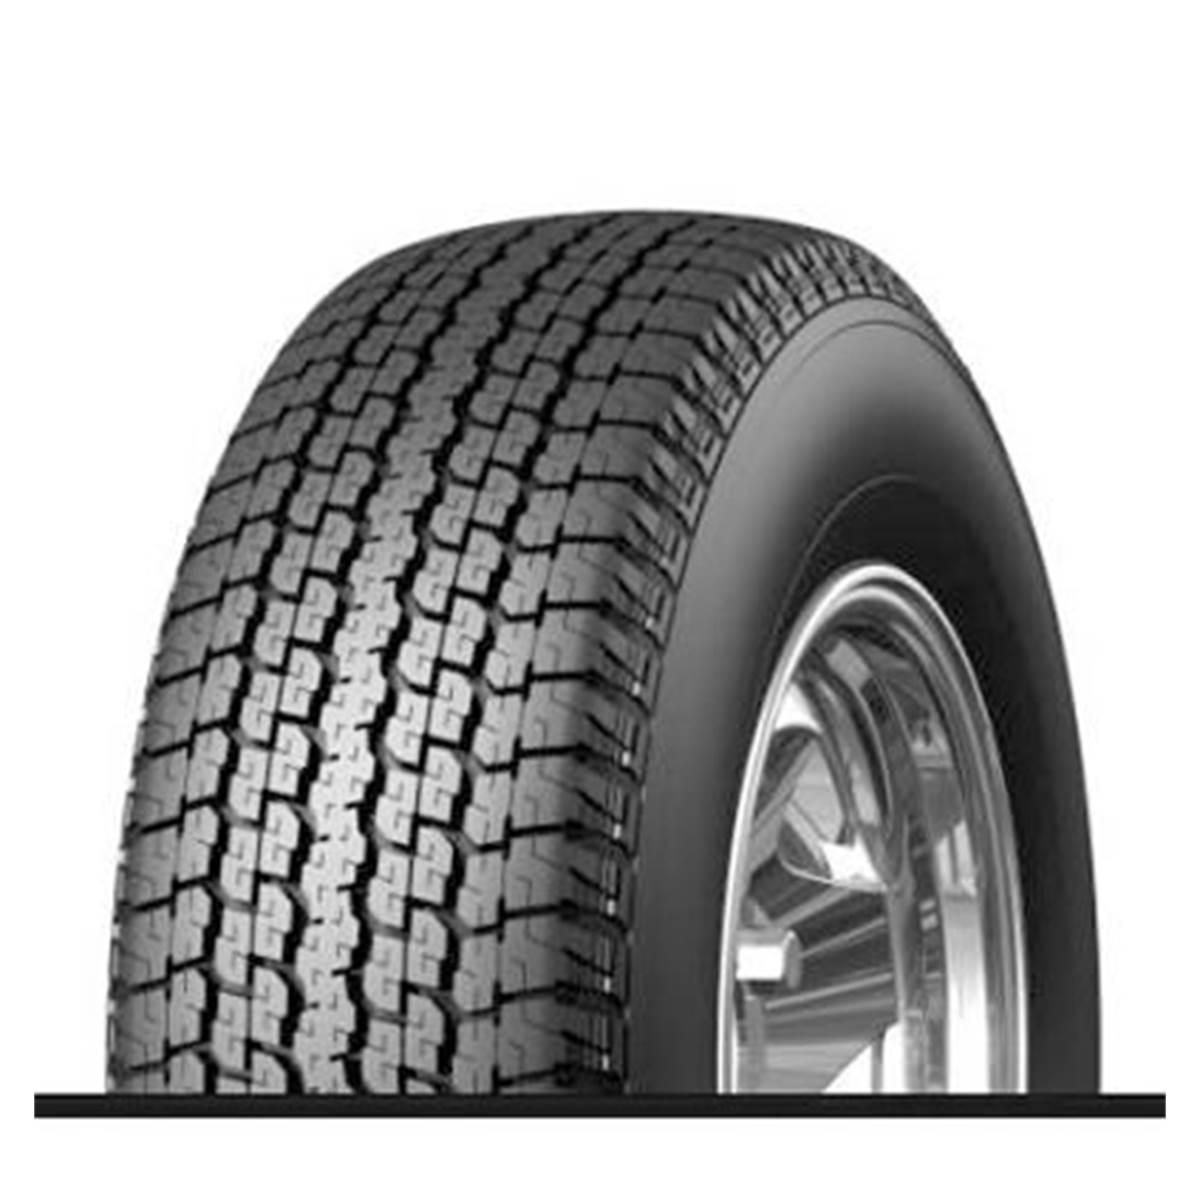 Pneu Bridgestone 235/70R16 106T DUELER D840